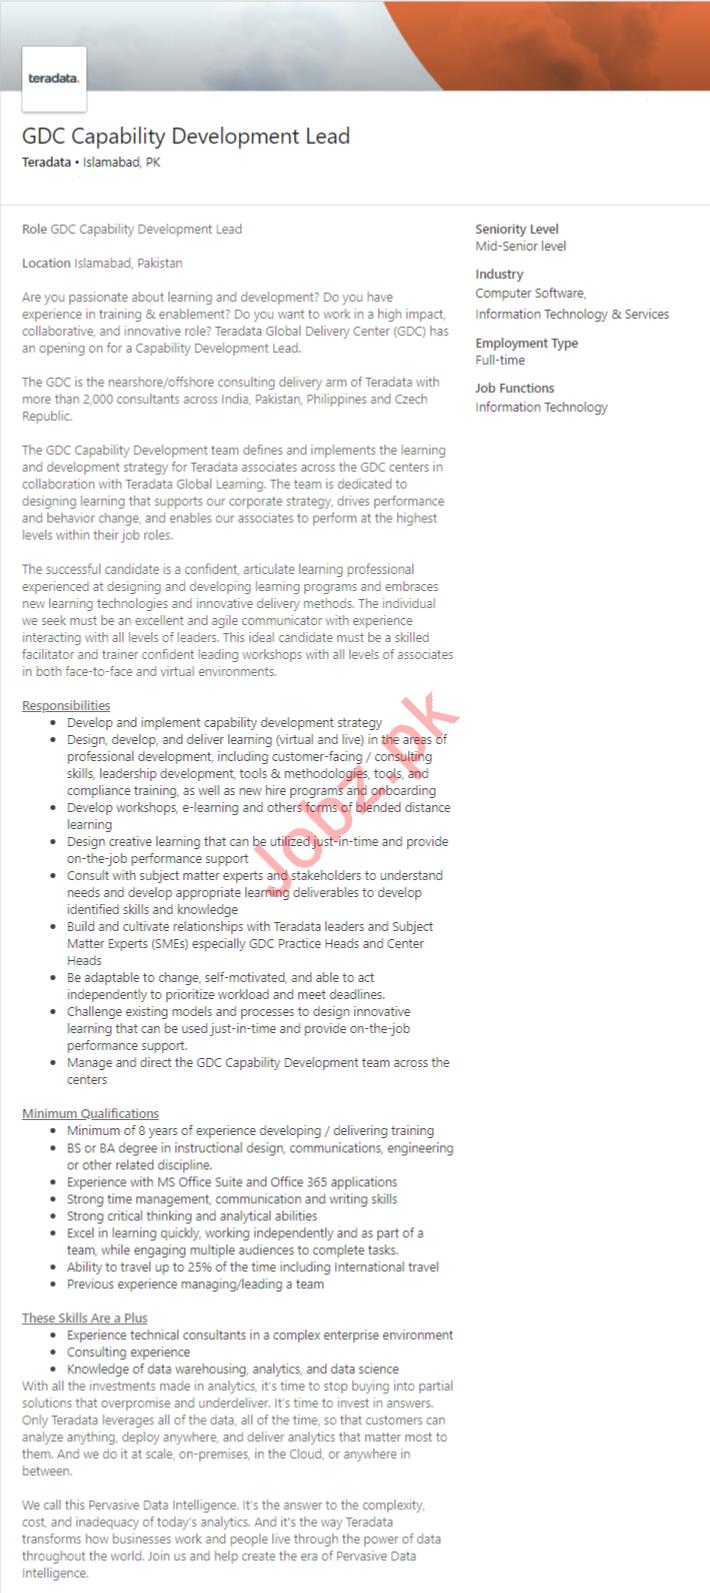 GDC Capability Development Lead Job in Islamabad